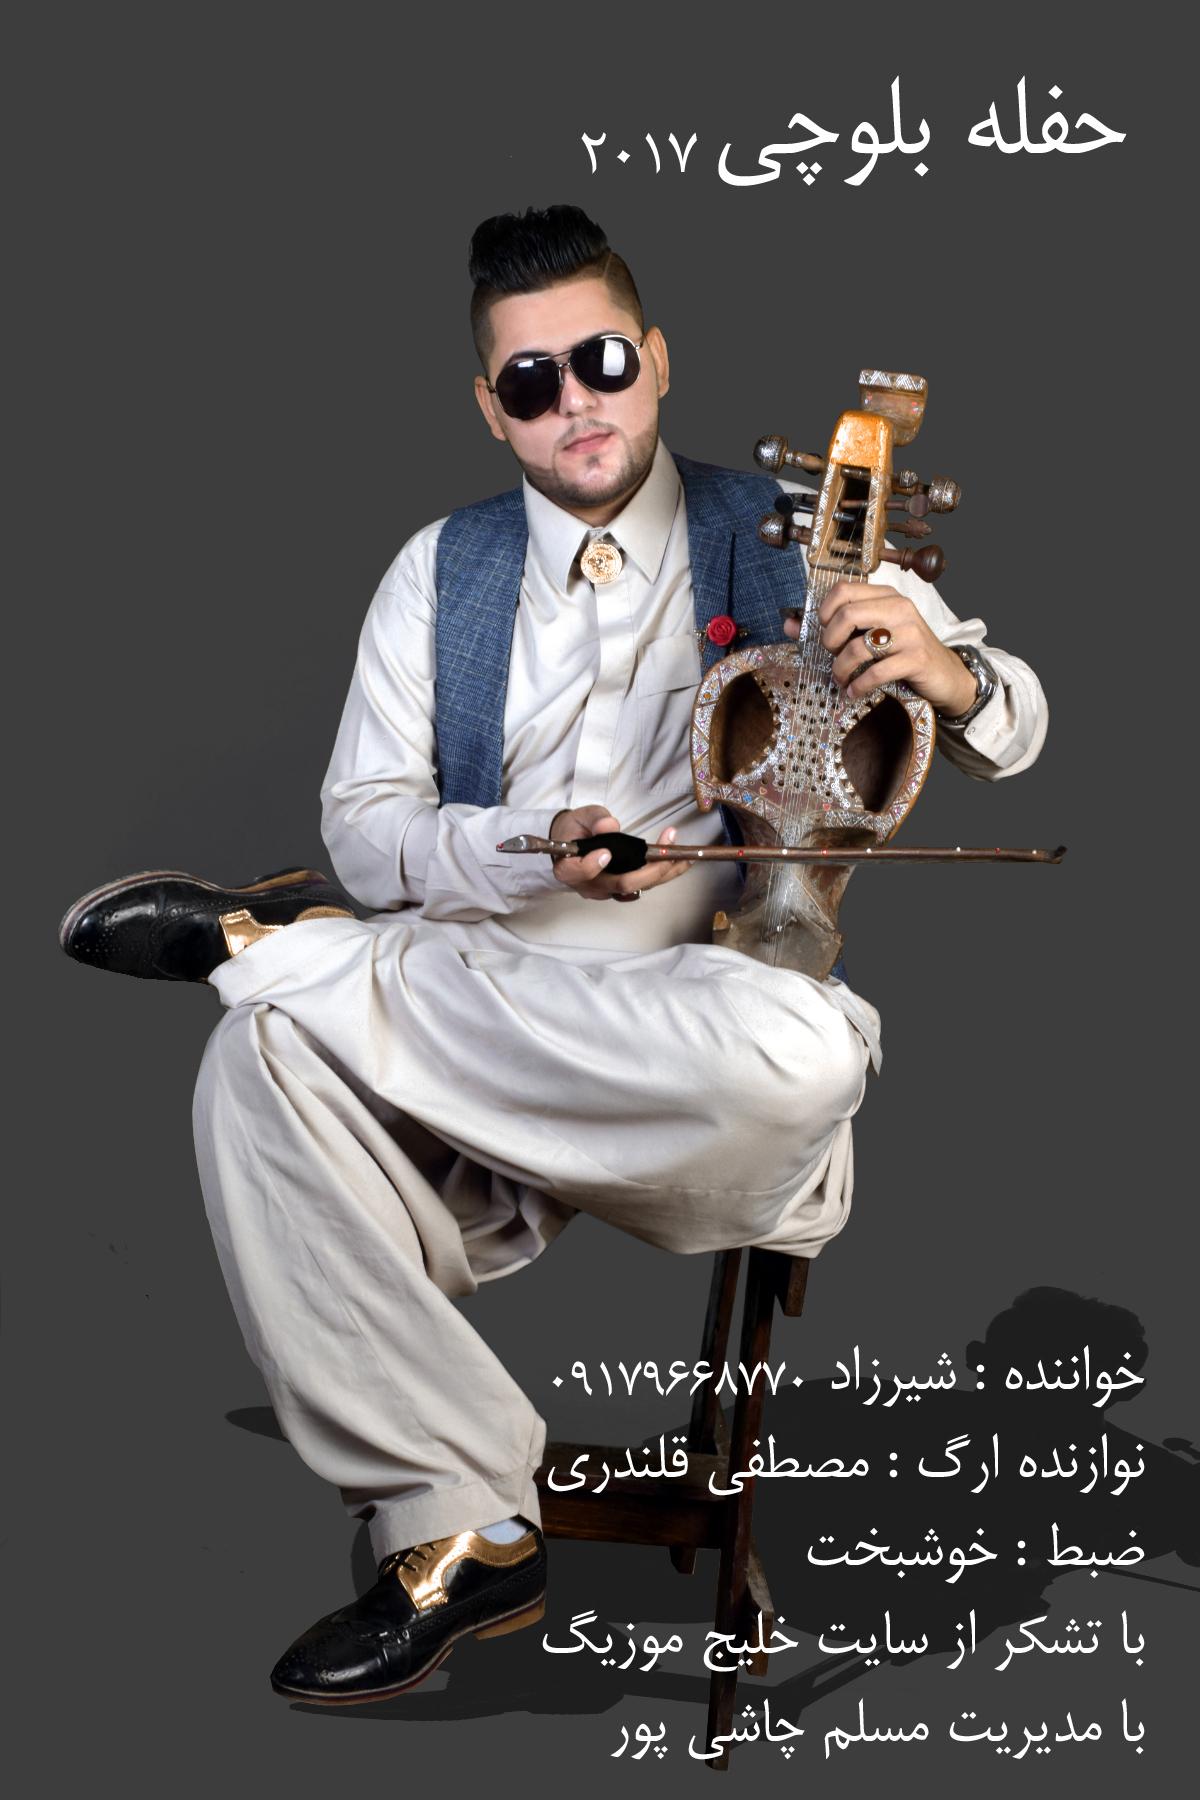 http://dl.khalijmusic.us/ax2/shirzad%204%20Asl.jpg